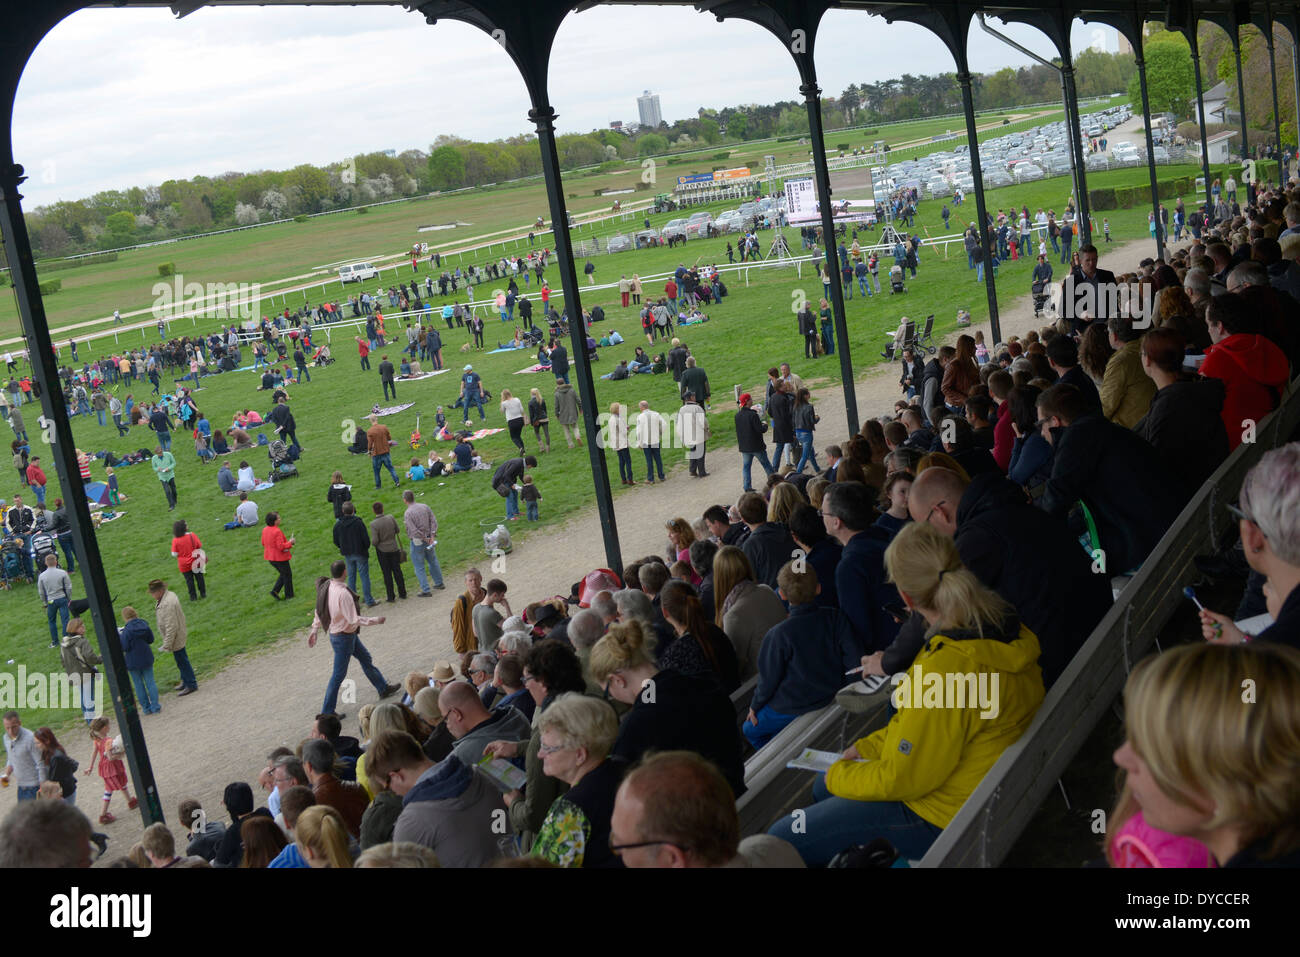 The Cologne-Weidenpesch Racecourse (Galopprennbahn Köln-Weidenpesch) in Nippes established as a race course in 1897 Stock Photo